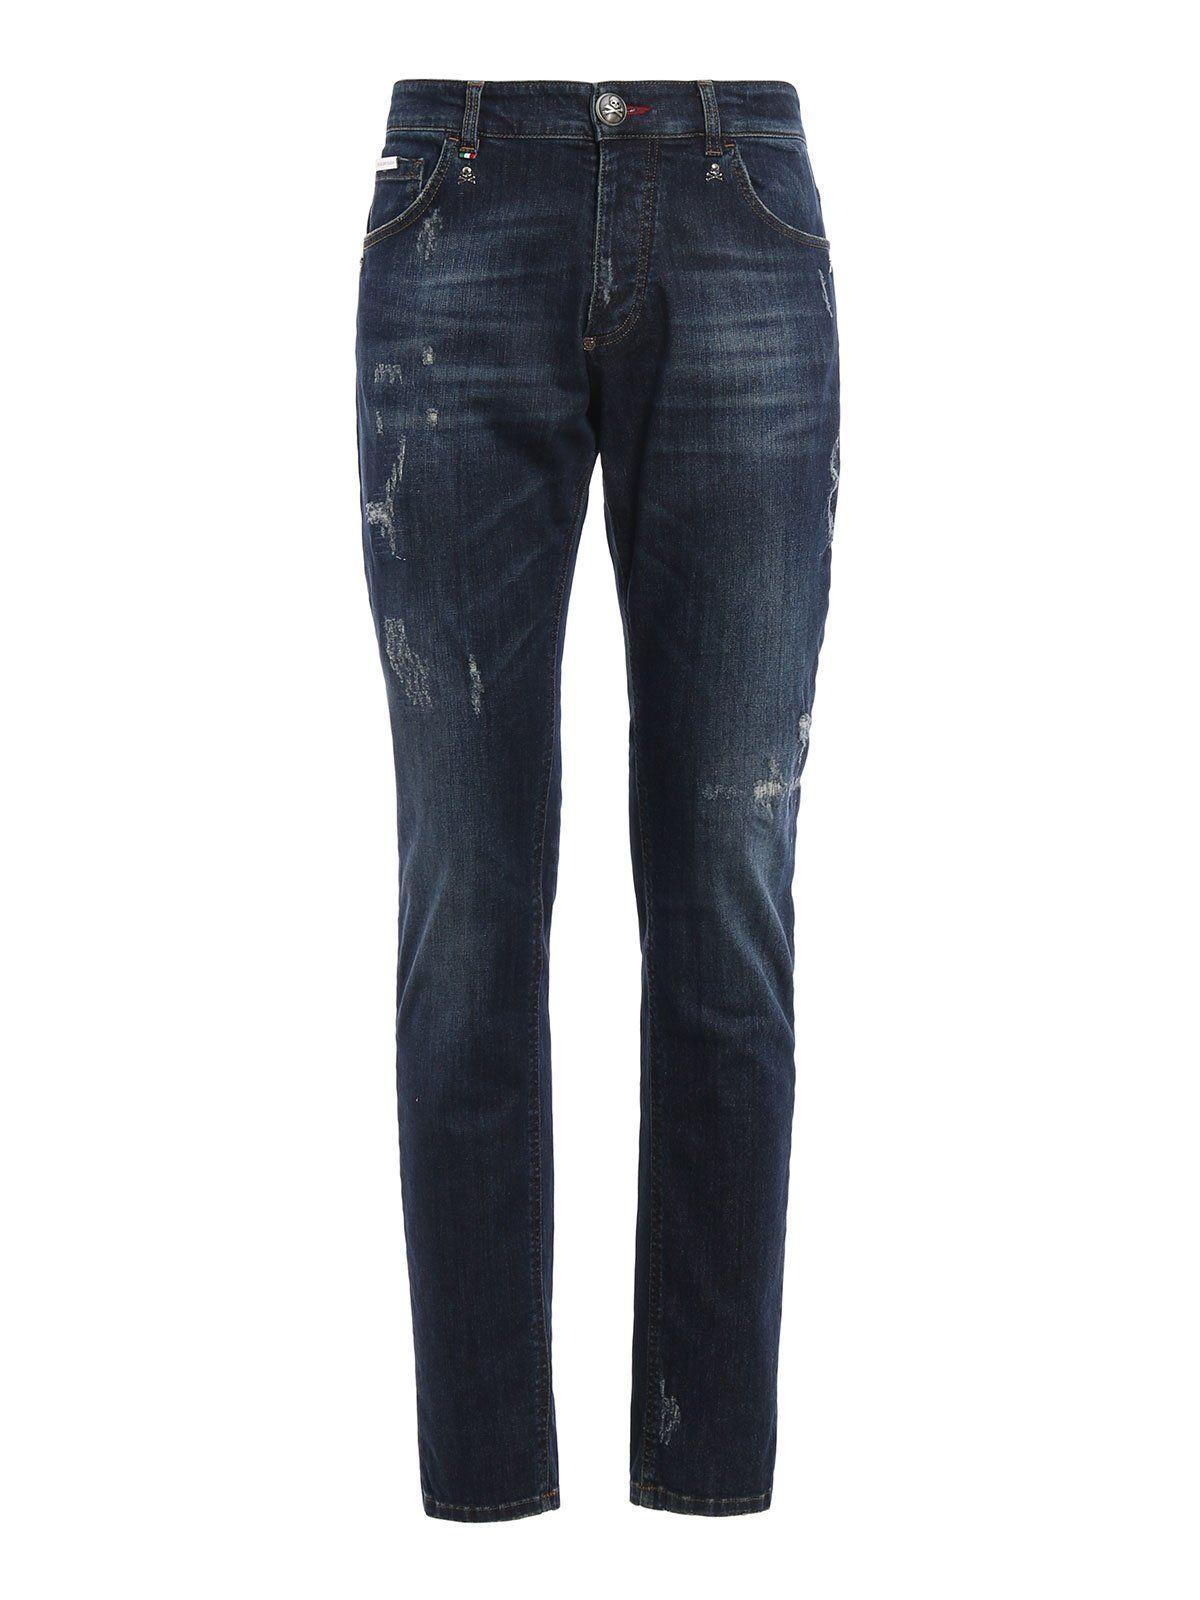 philipp plein philipp plein akio jeans blue men 39 s. Black Bedroom Furniture Sets. Home Design Ideas